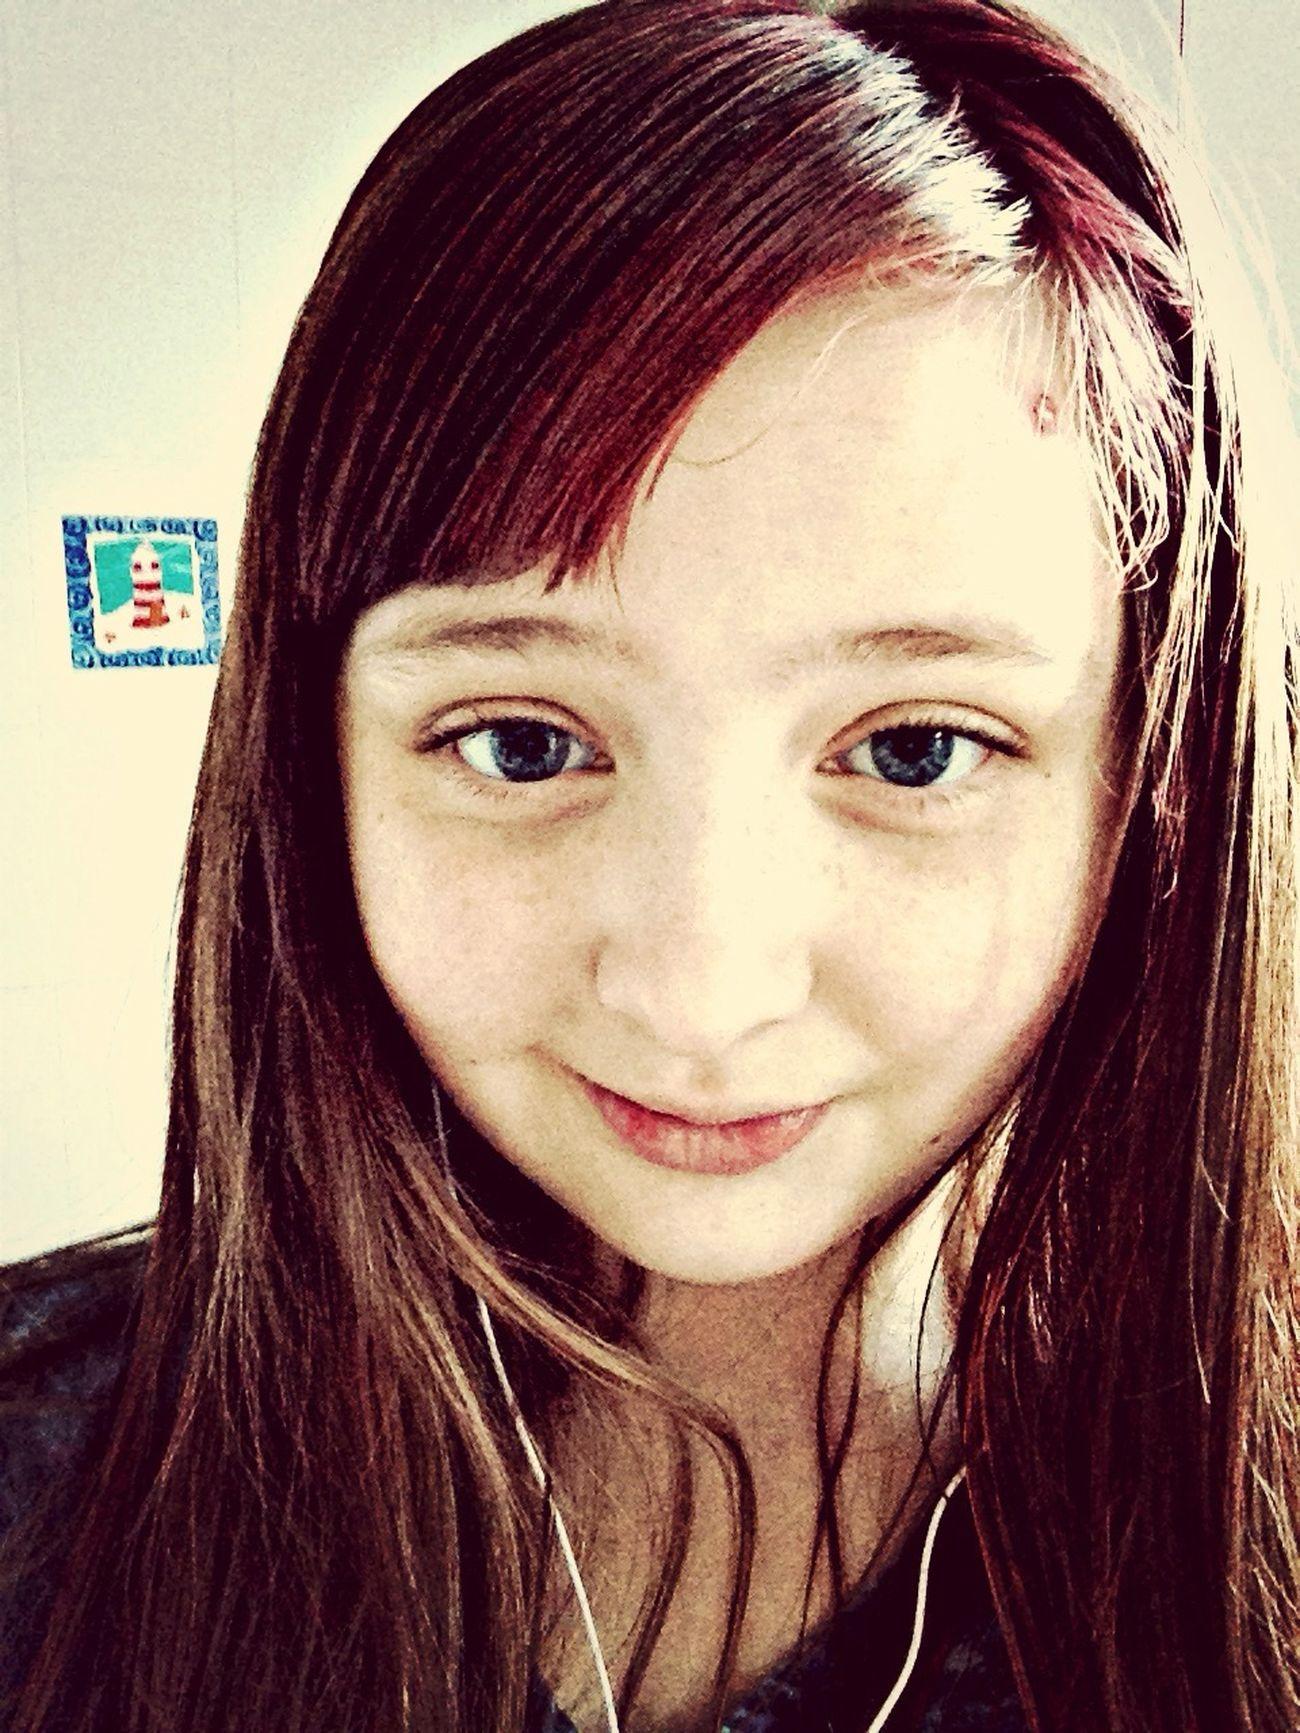 Pinkhair BlueEyes SmileX3